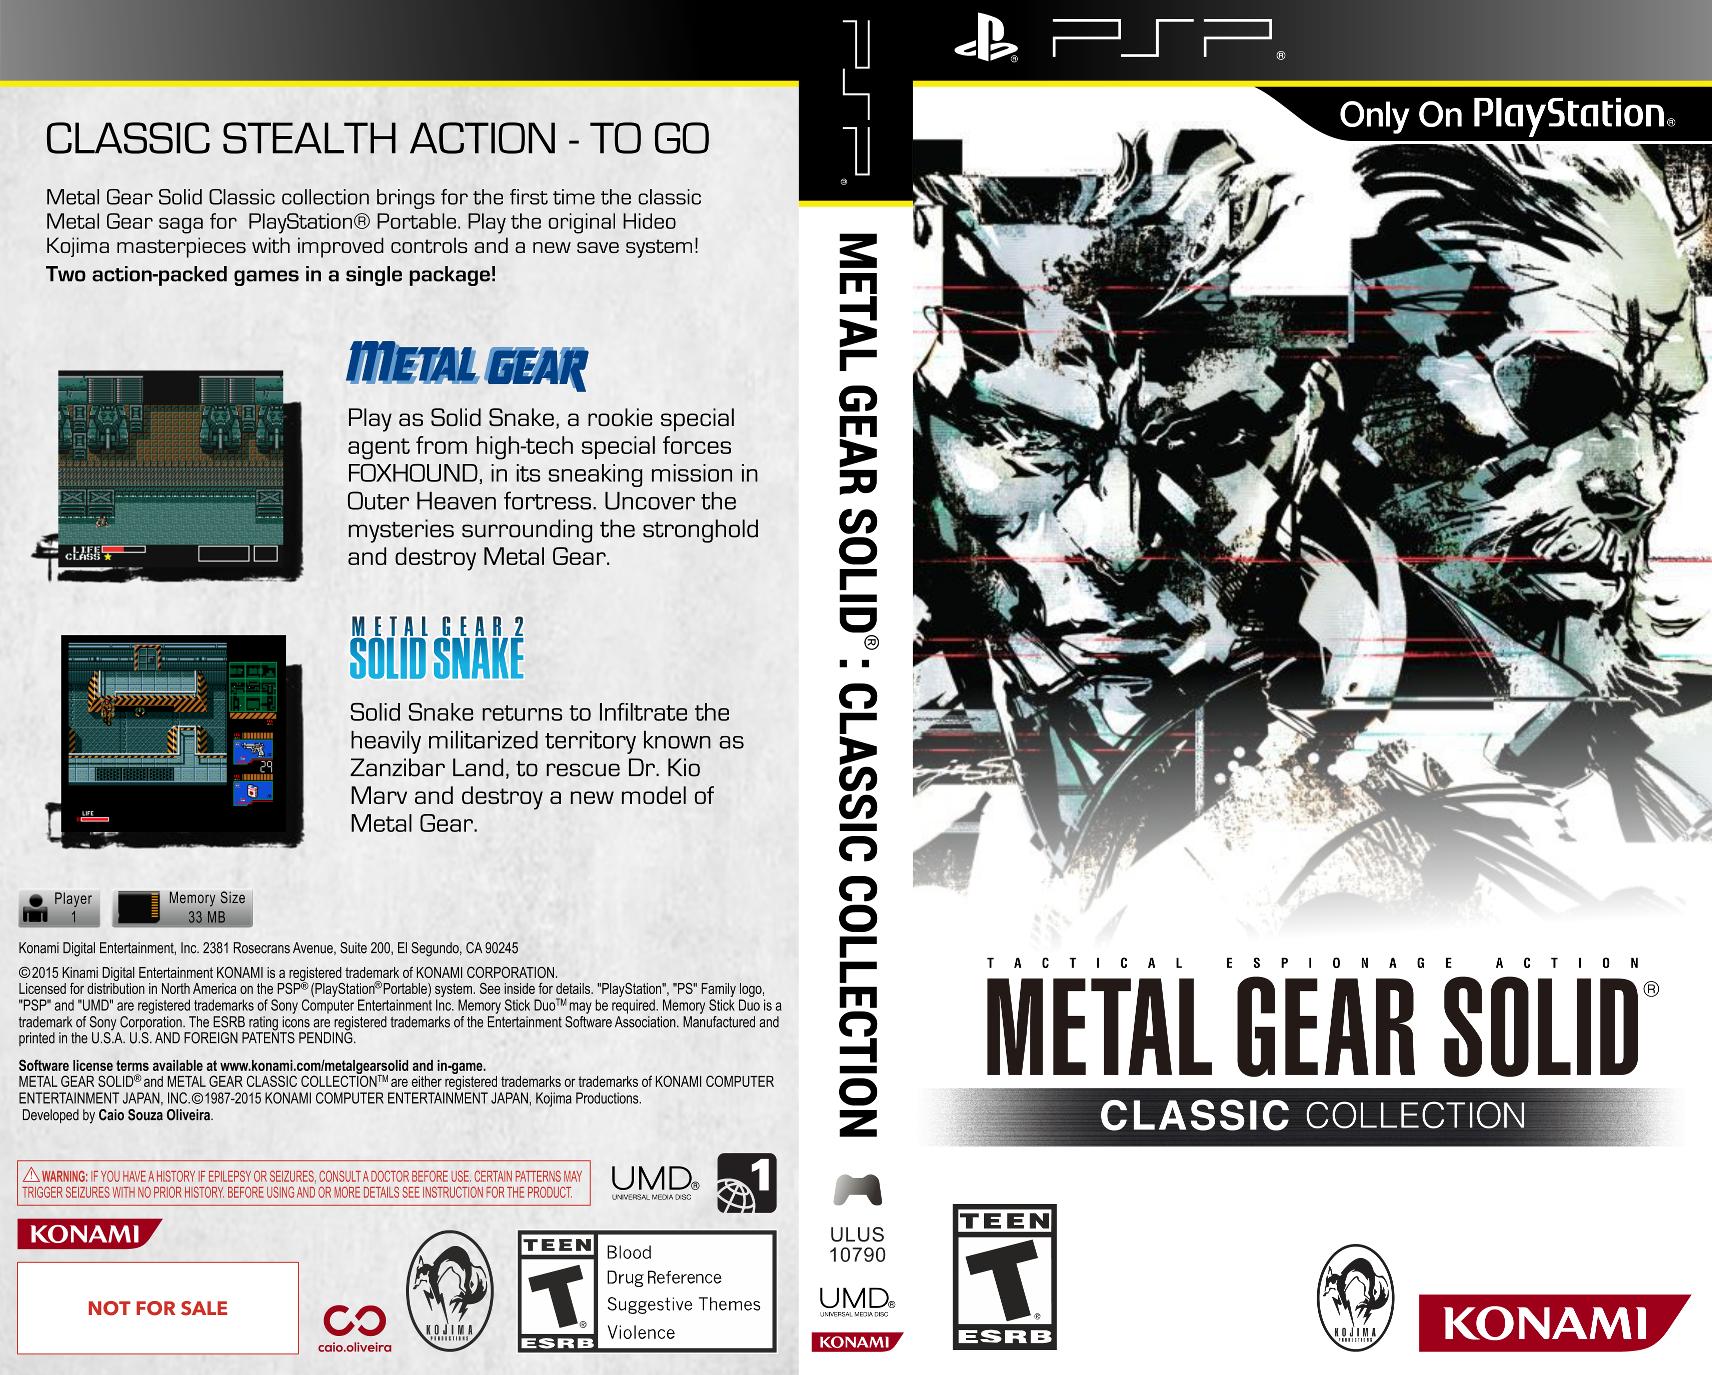 metal gear solid classic collection fan games and programs forum rh forum starmen net Metal Gear 2 MSX Metal Gear 2 Substance Windows 7